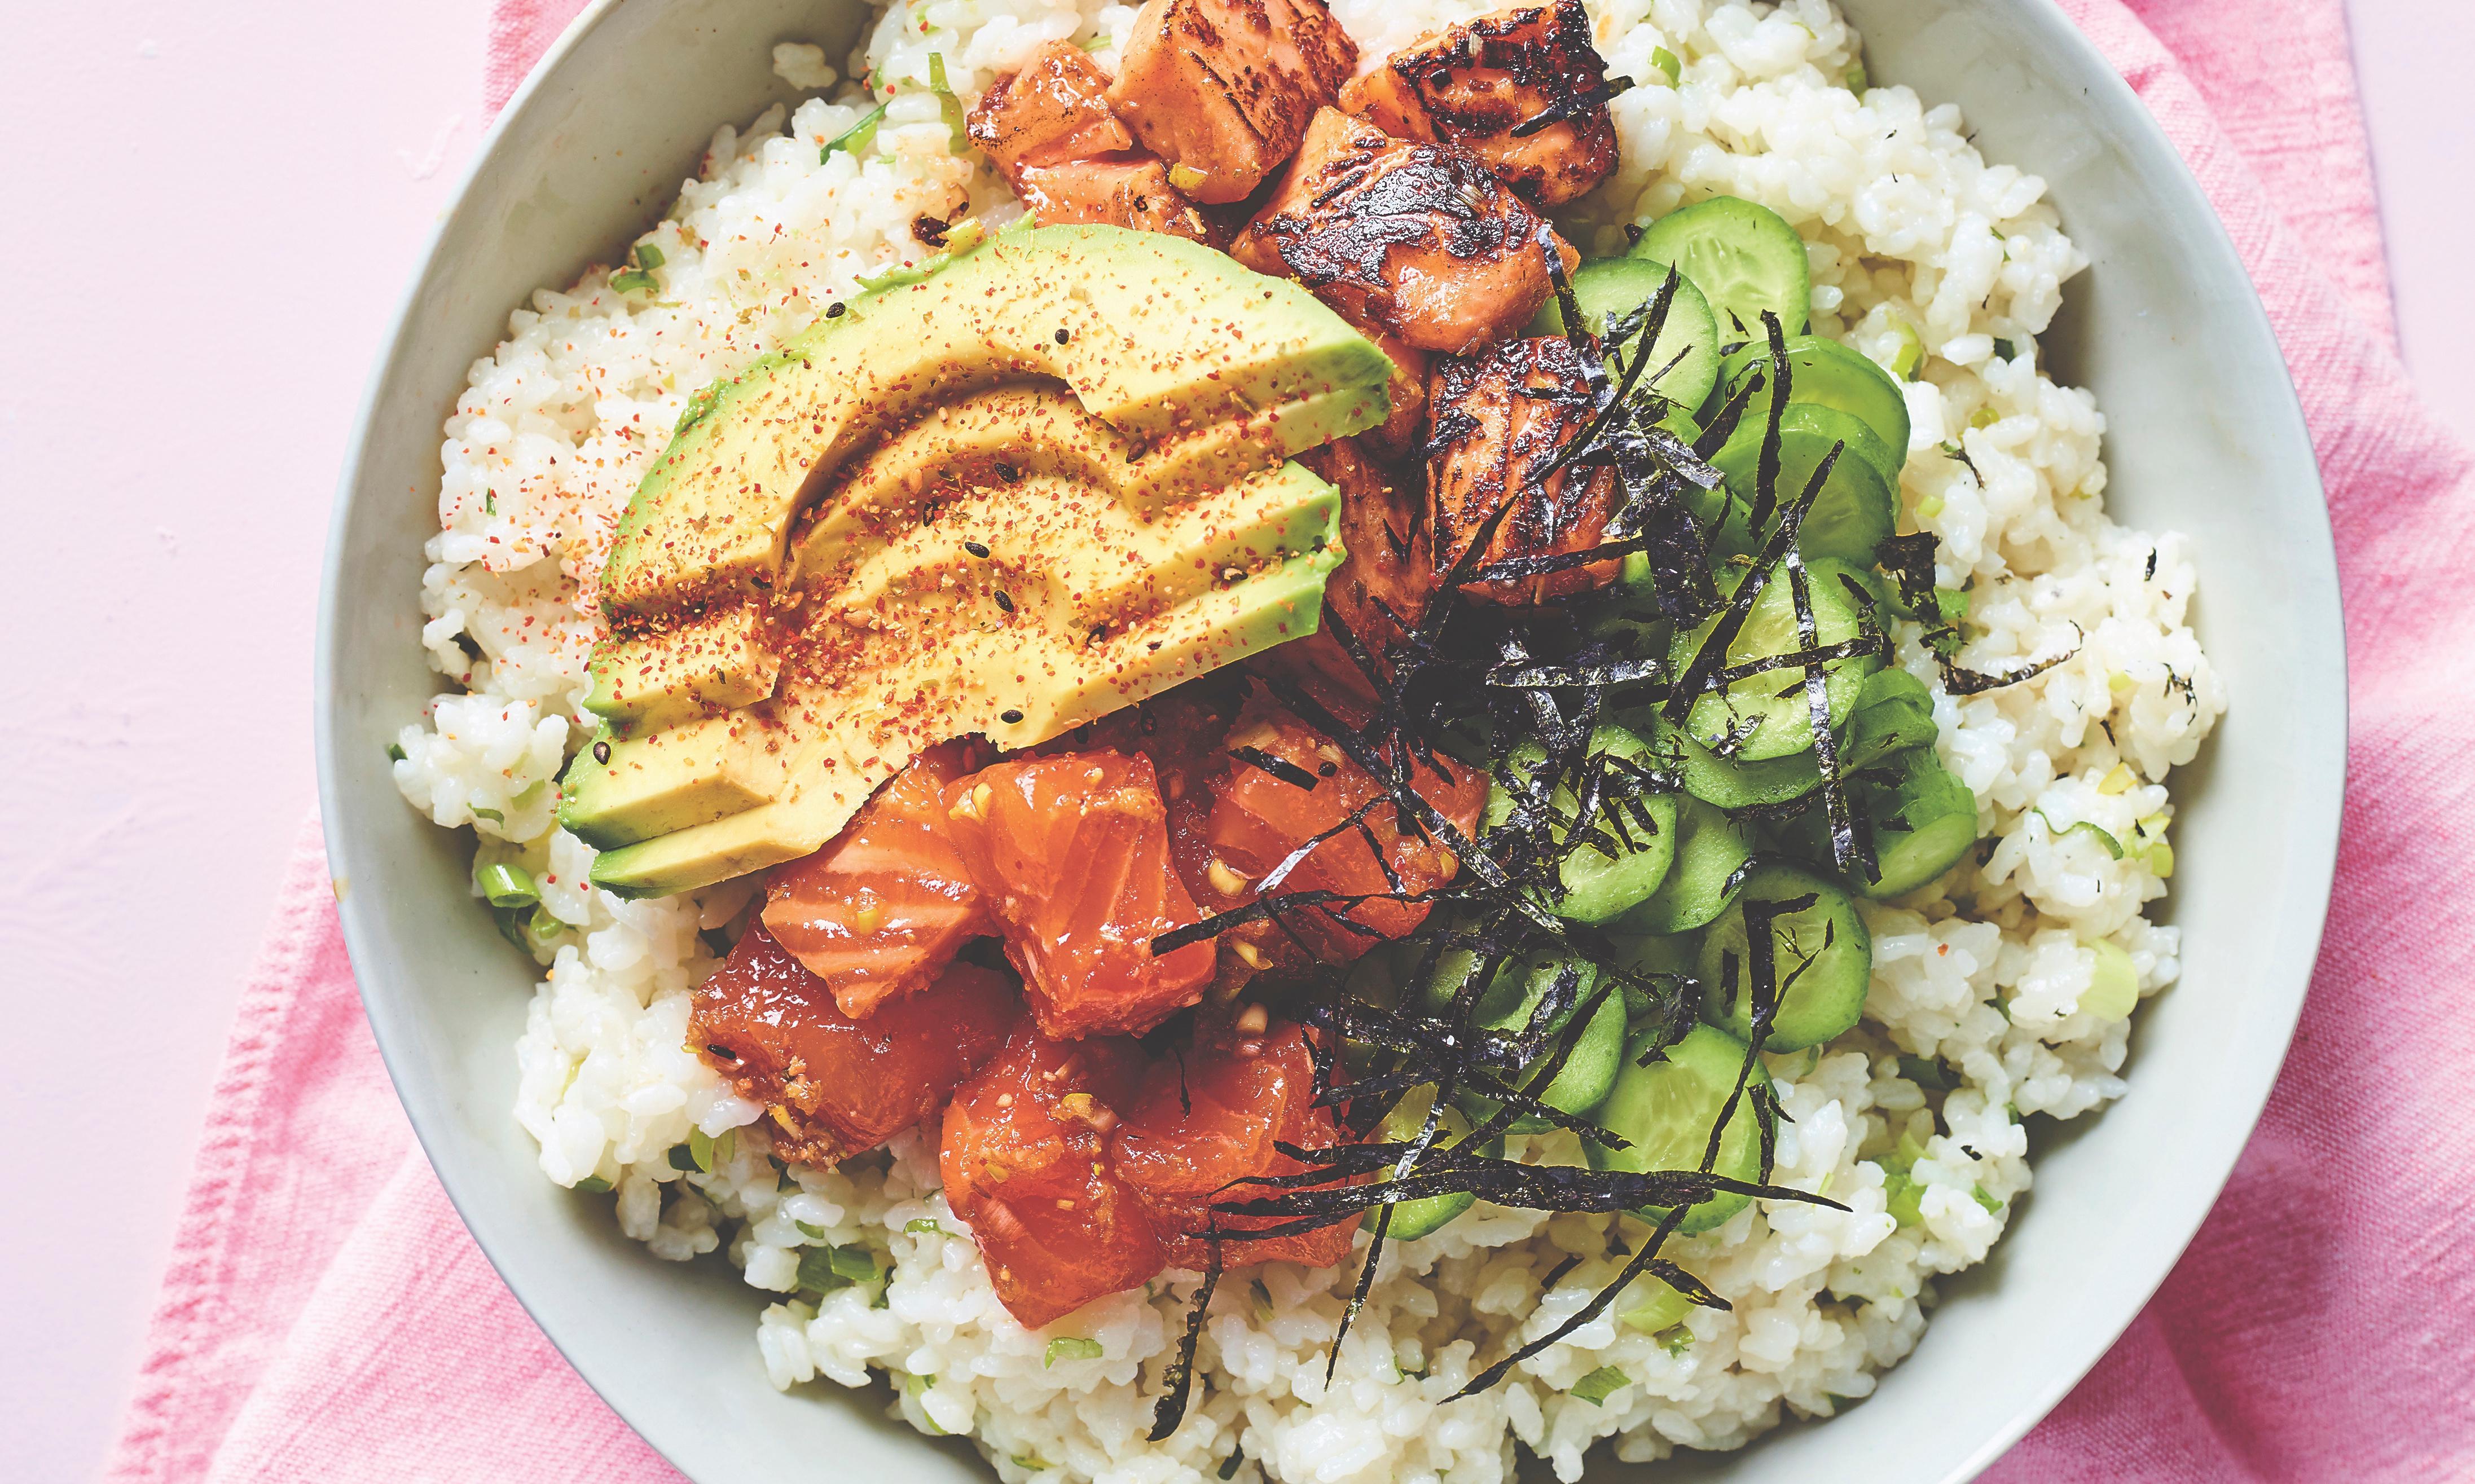 Matt Preston's scorched and raw teriyaki poke recipe